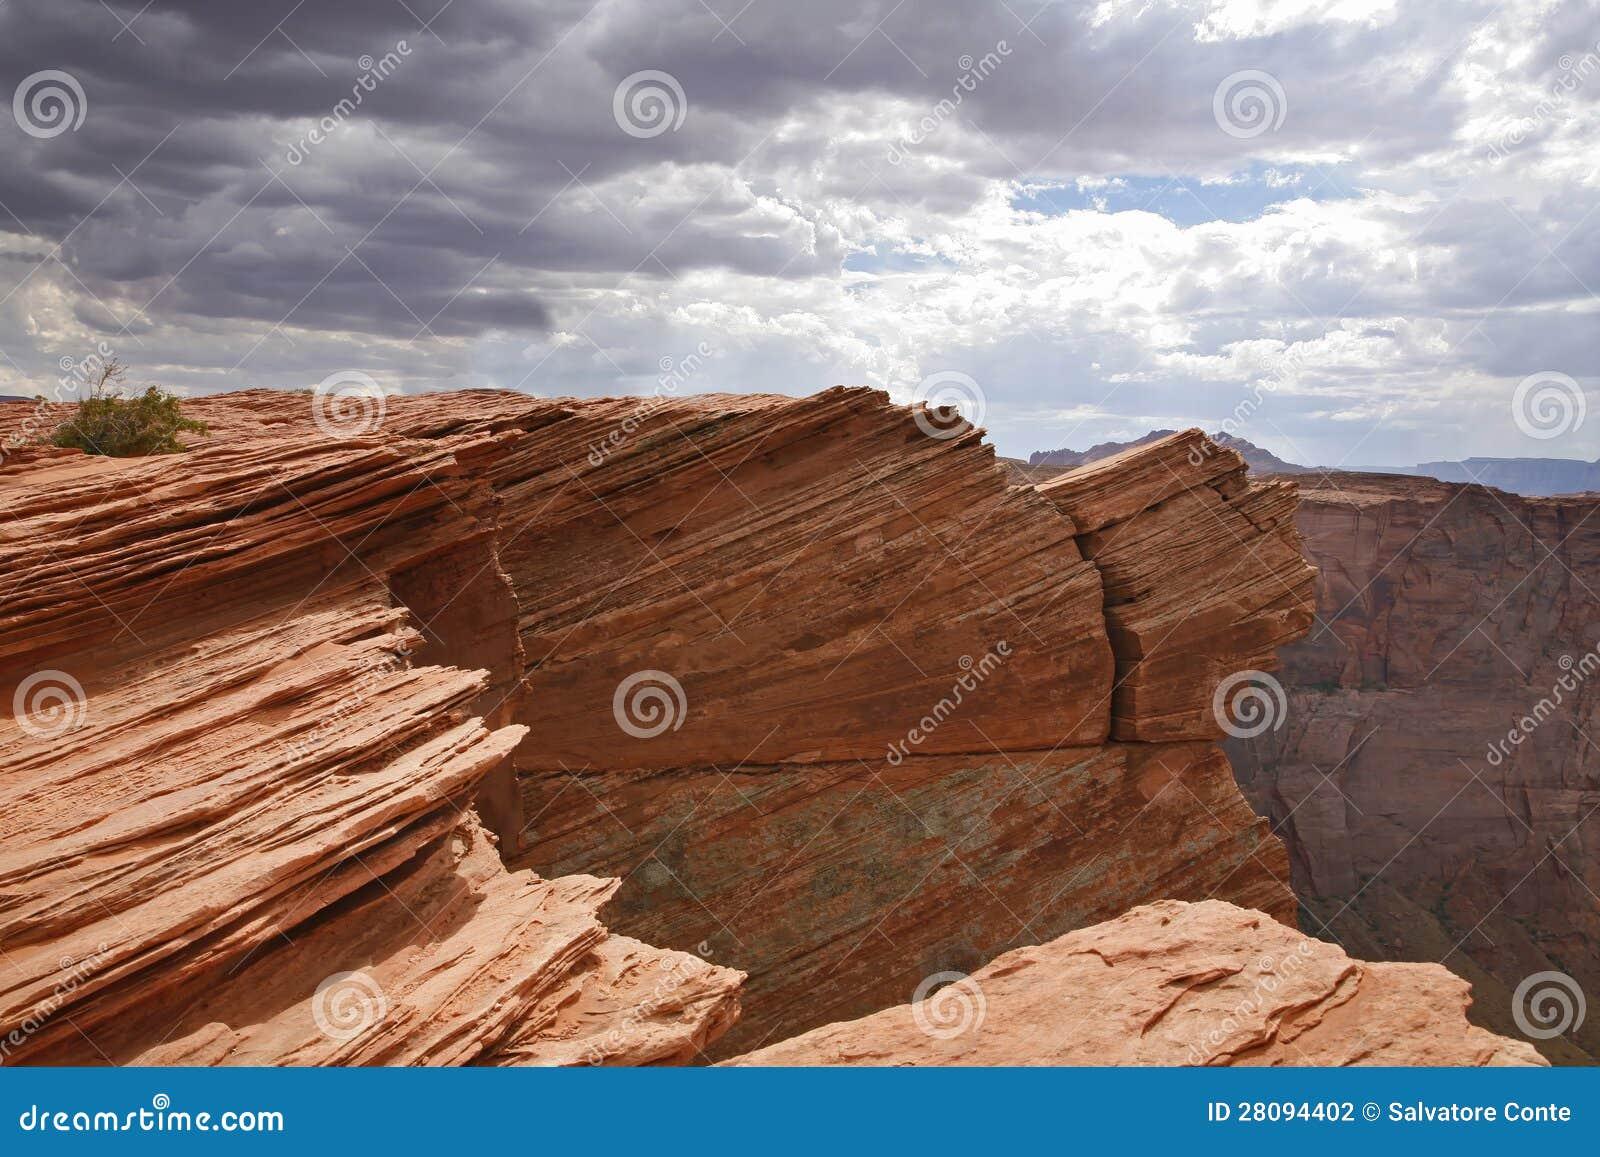 Deserto vermelho e céu nebuloso, página - o Arizona